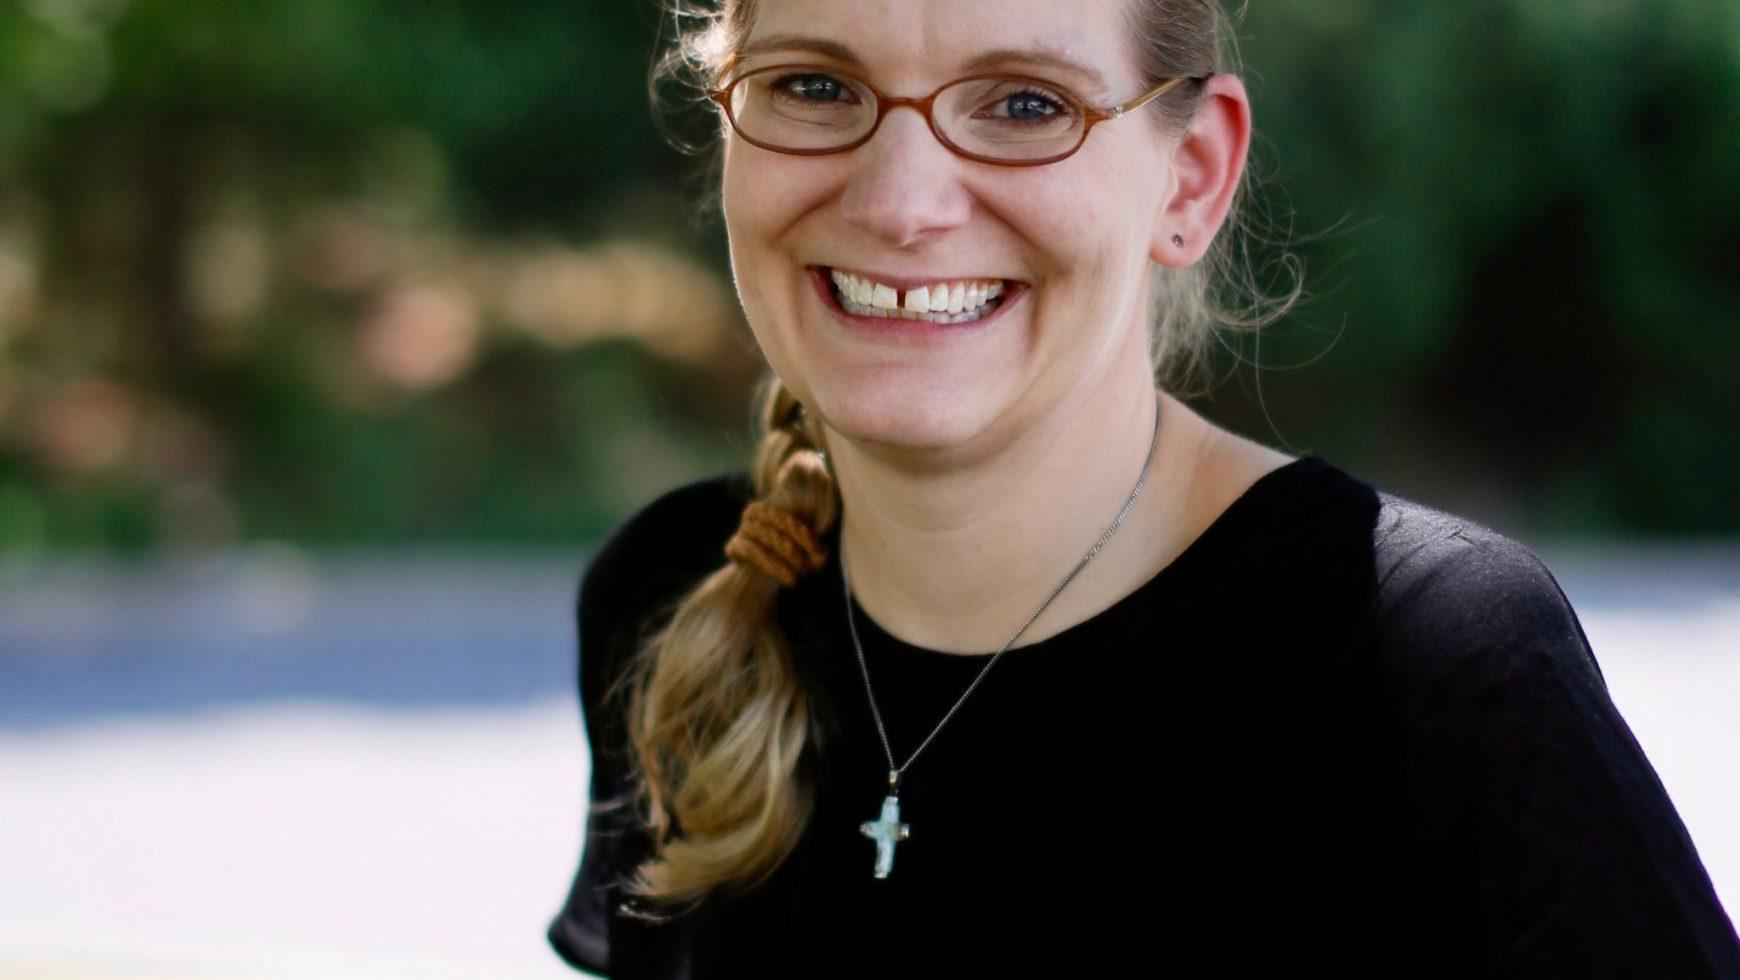 Meredith Lawser